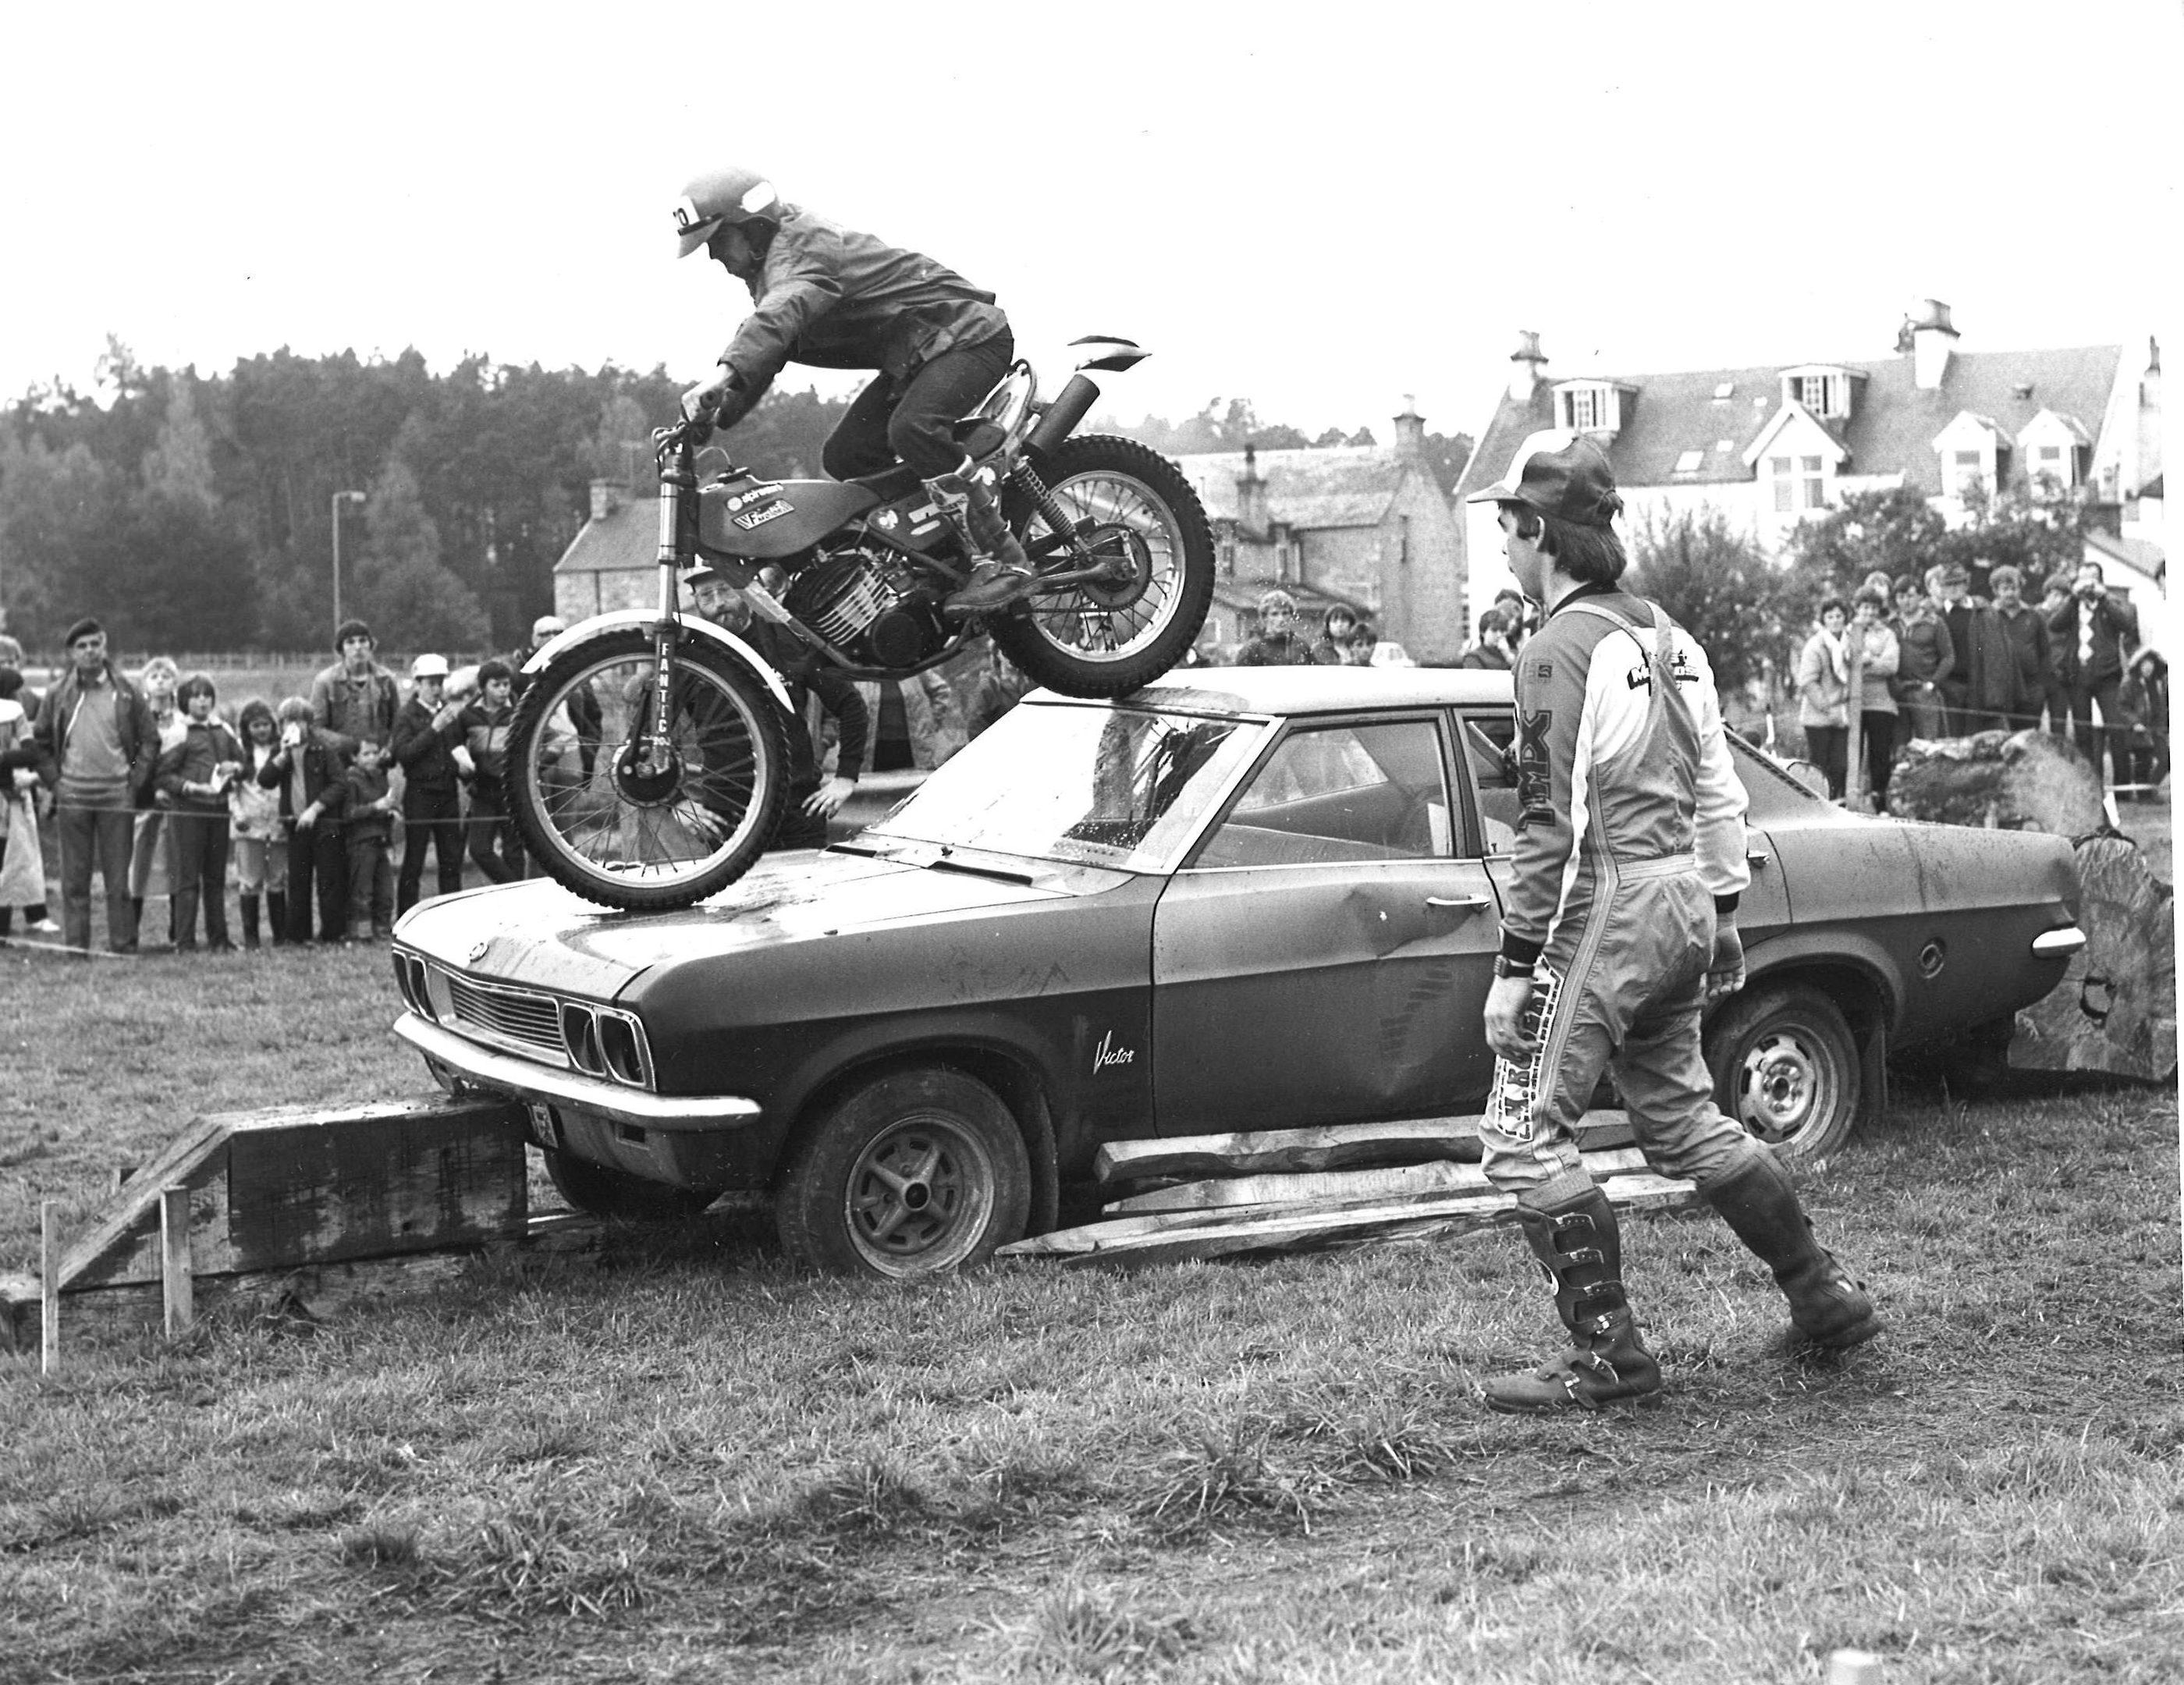 Fort William motorcyclist Scott McWilliam at Carrbridge Celildh Week, 1982